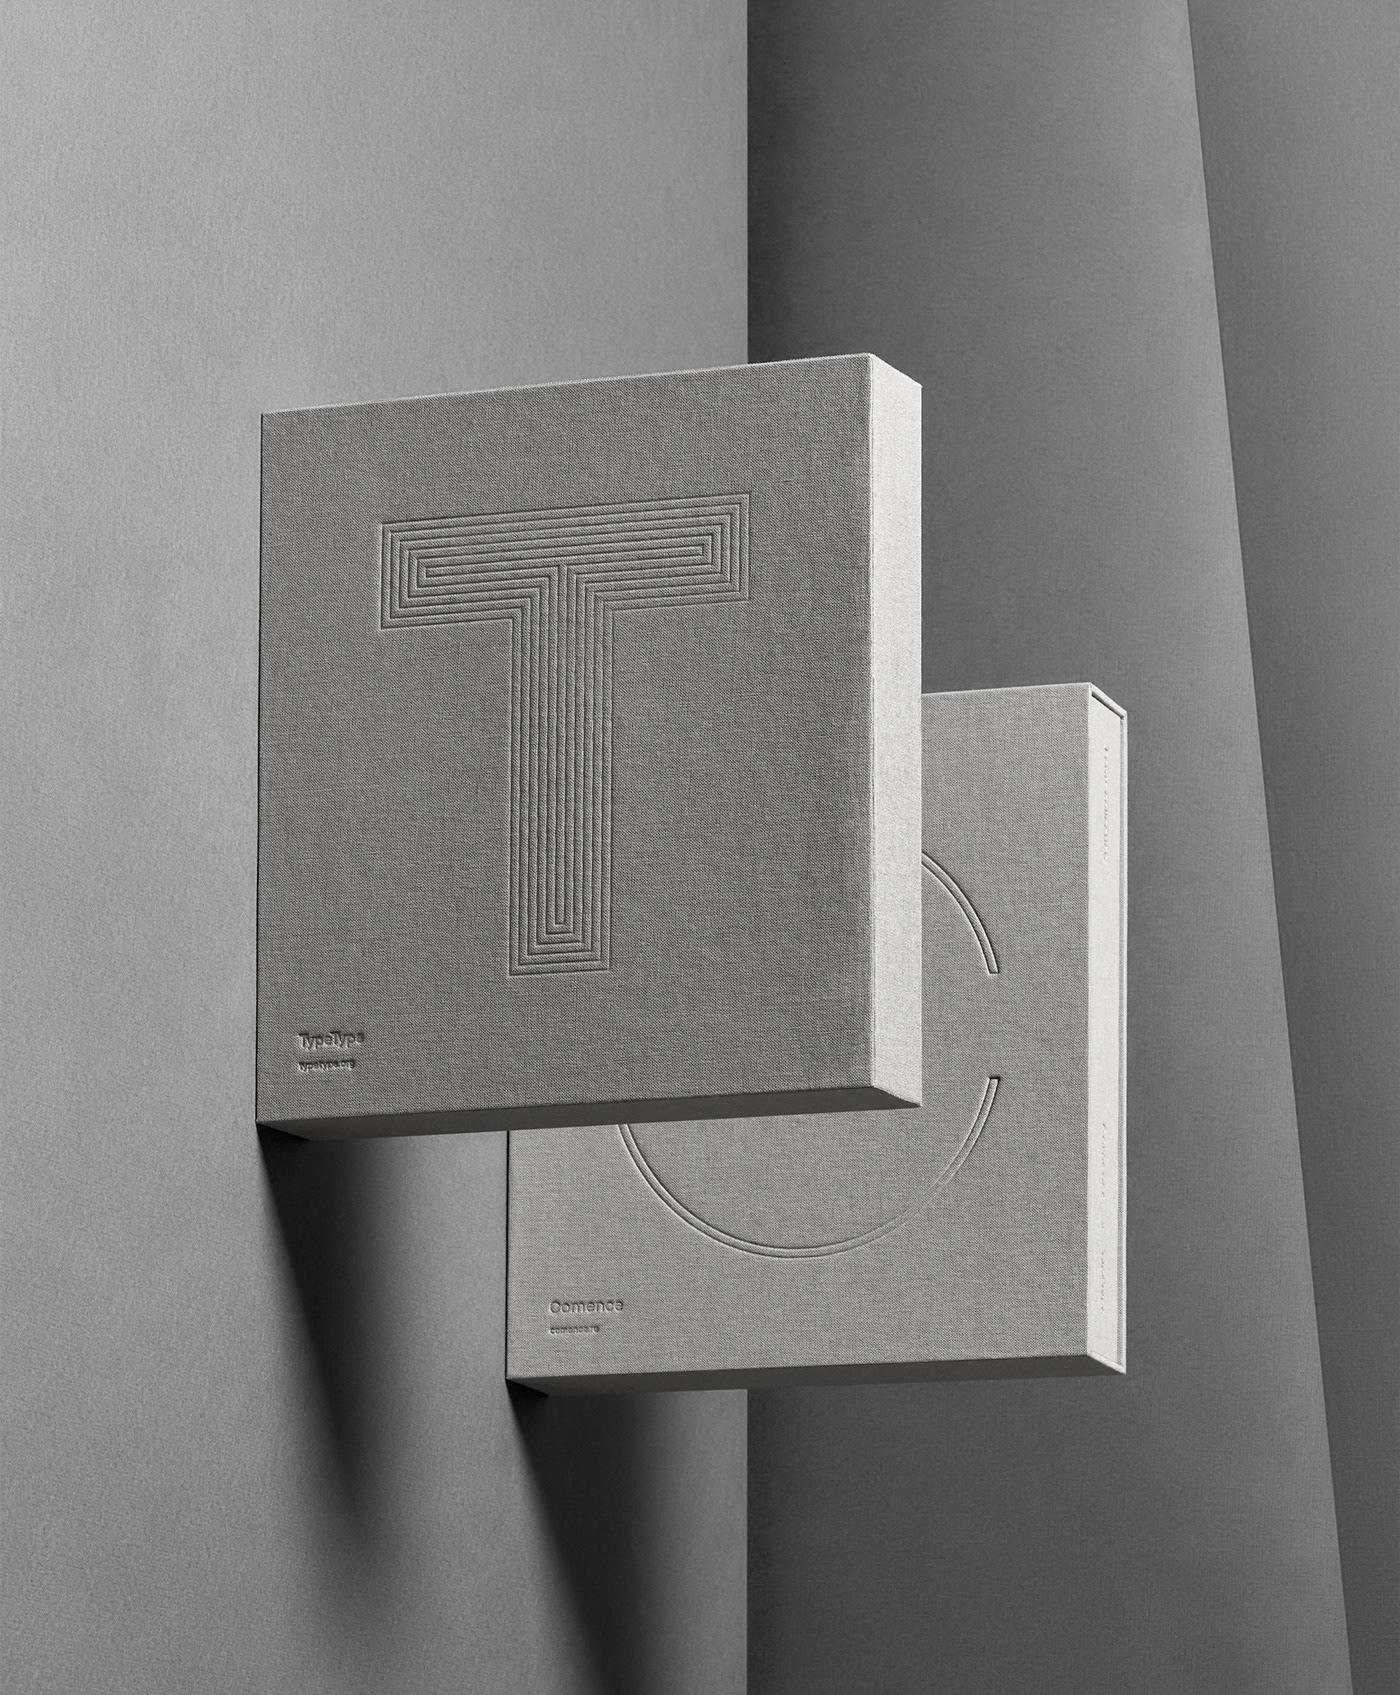 Image may contain: wall, art and book